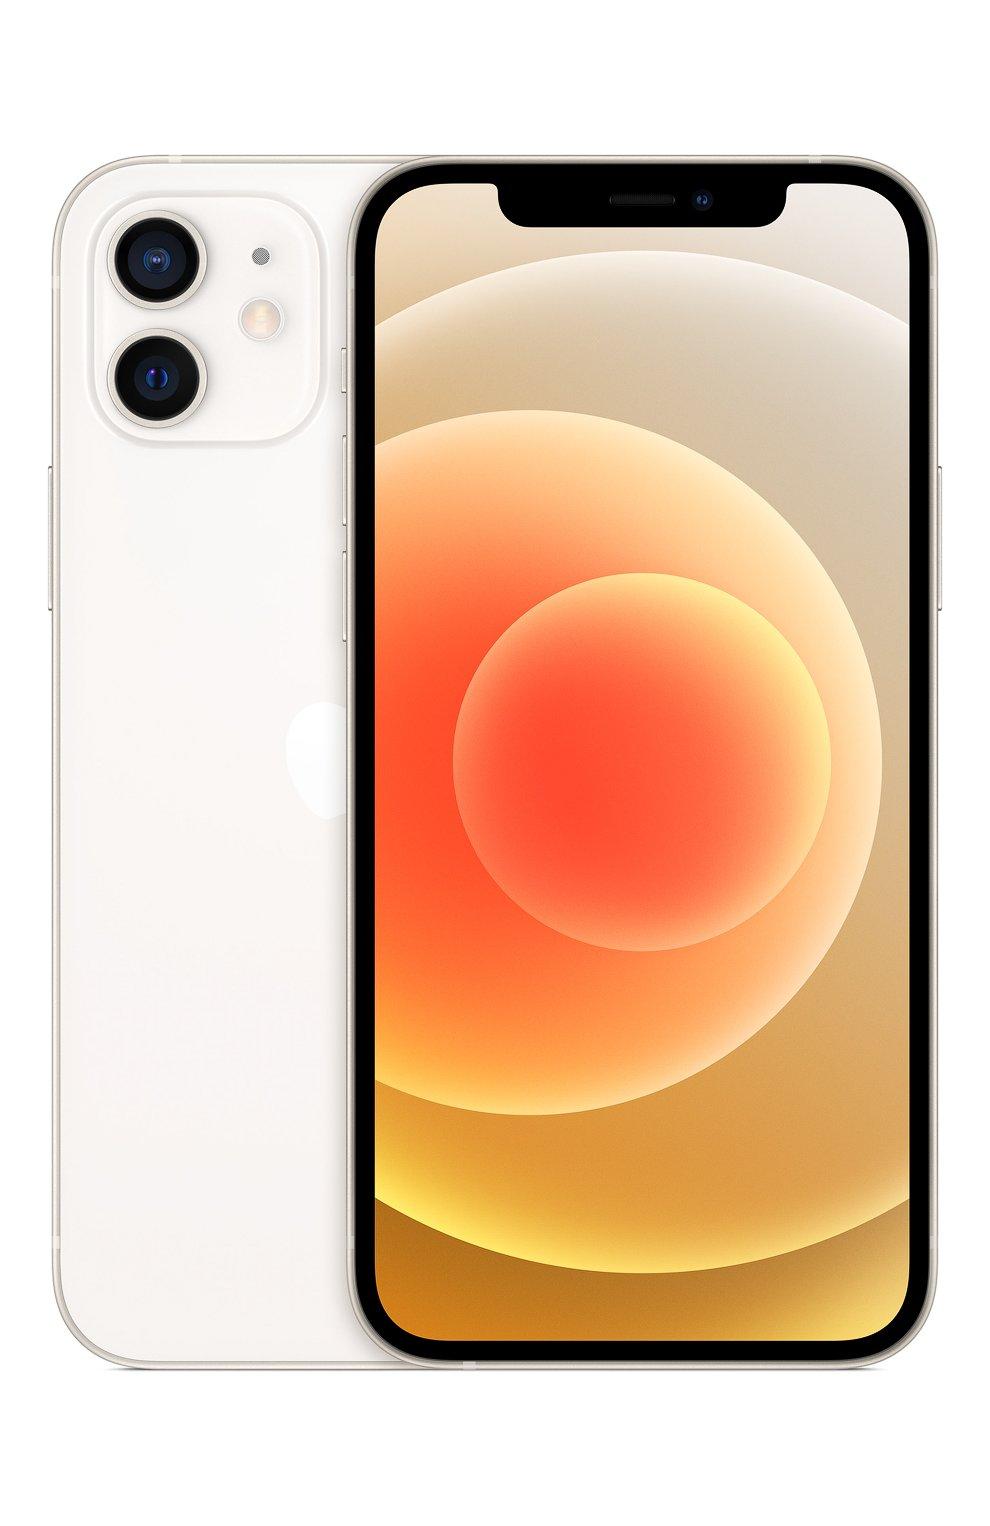 Мужские iphone 12 128gb white APPLE  white цвета, арт. MGJC3RU/A | Фото 1